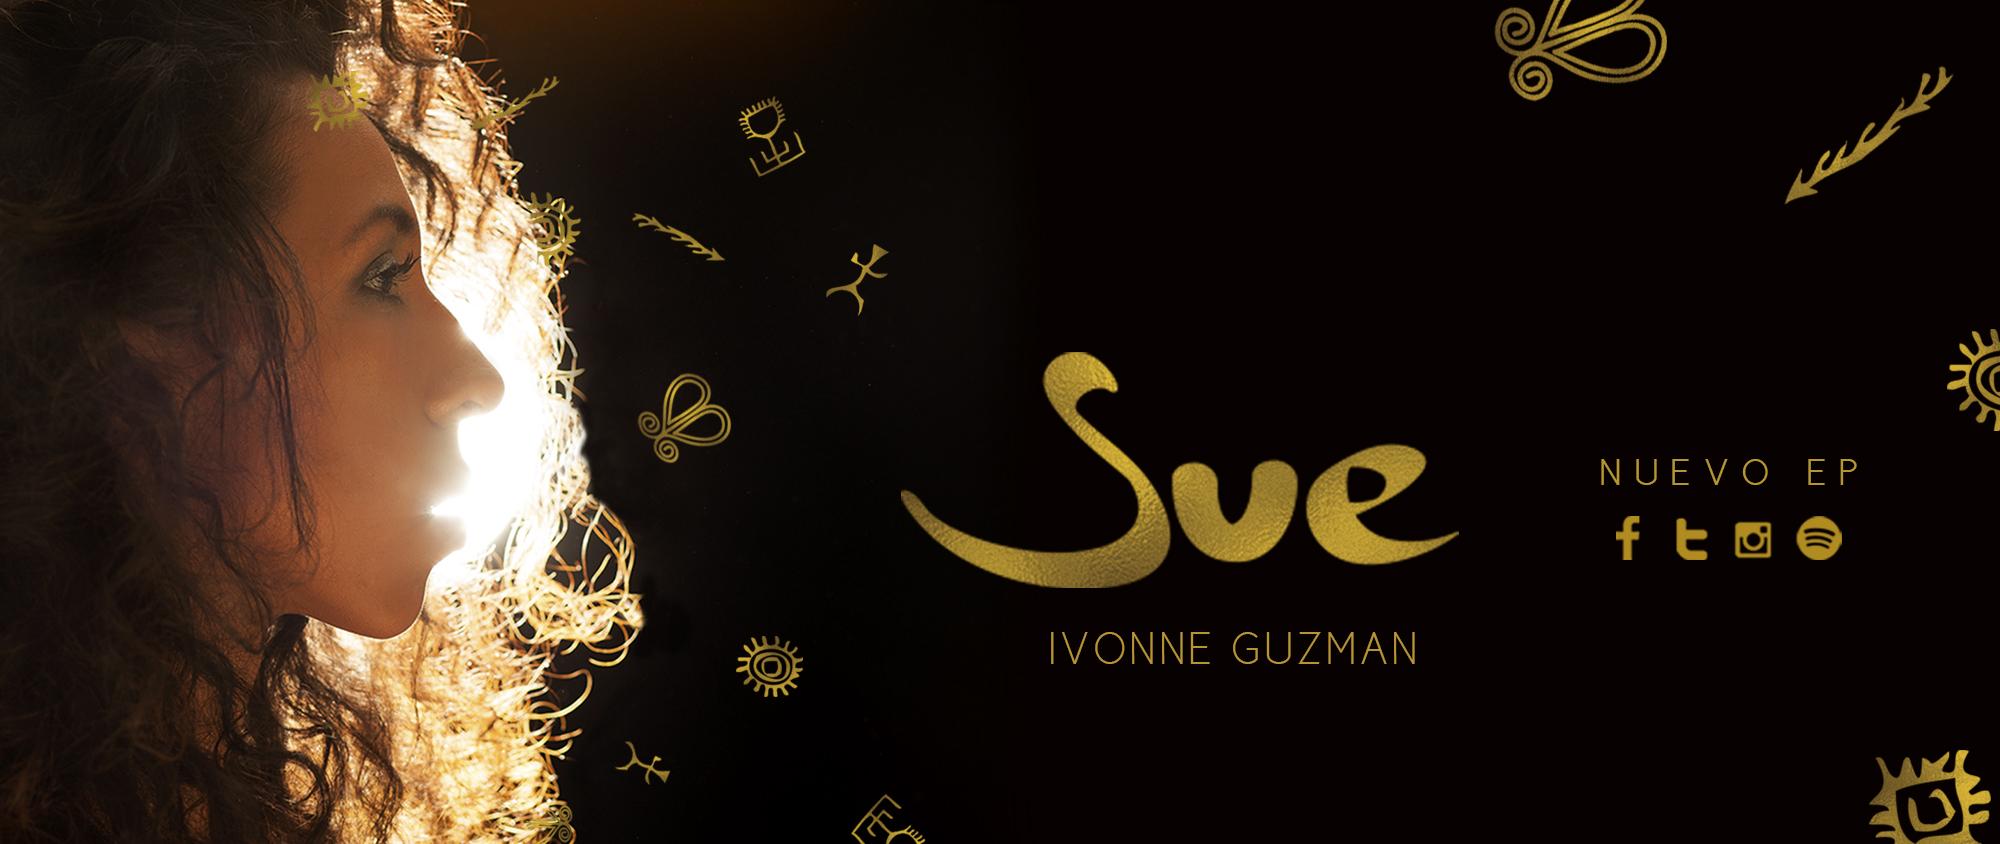 EP Ivonne Guzman